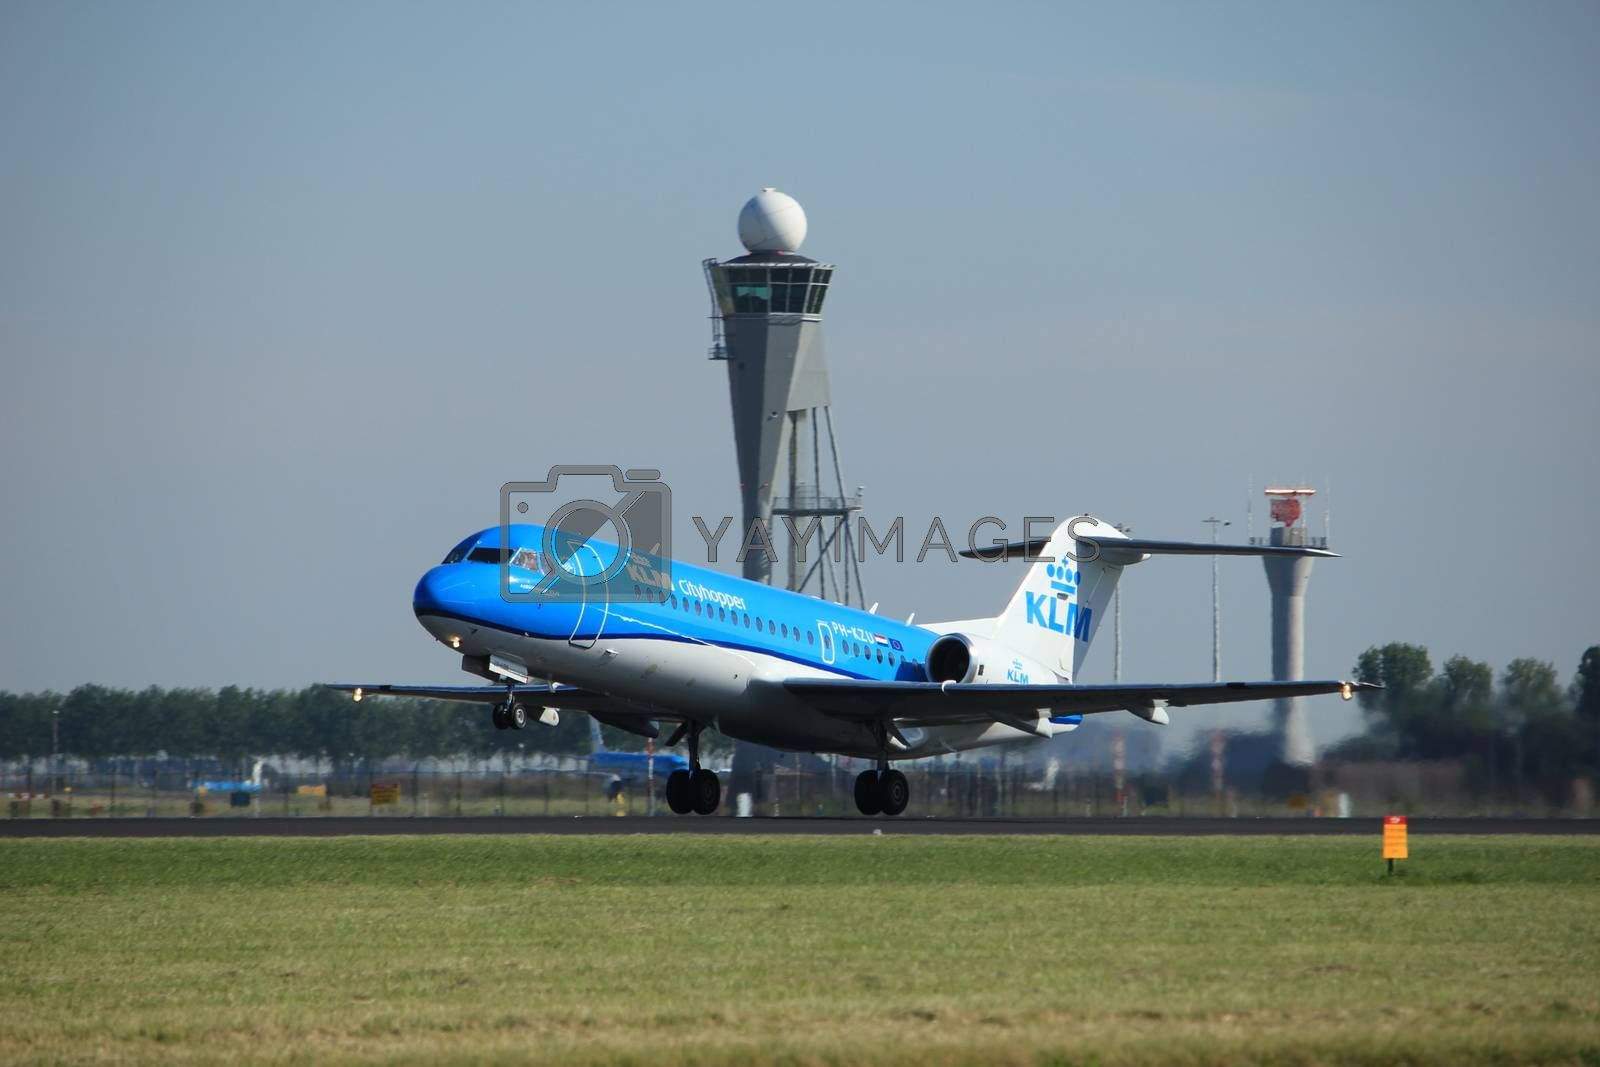 Amsterdam, the Netherlands  - August, 18th 2016: PH-KZU  KLM Cityhopper Fokker F70, taking off from Polderbaan Runway Amsterdam Airport Schiphol